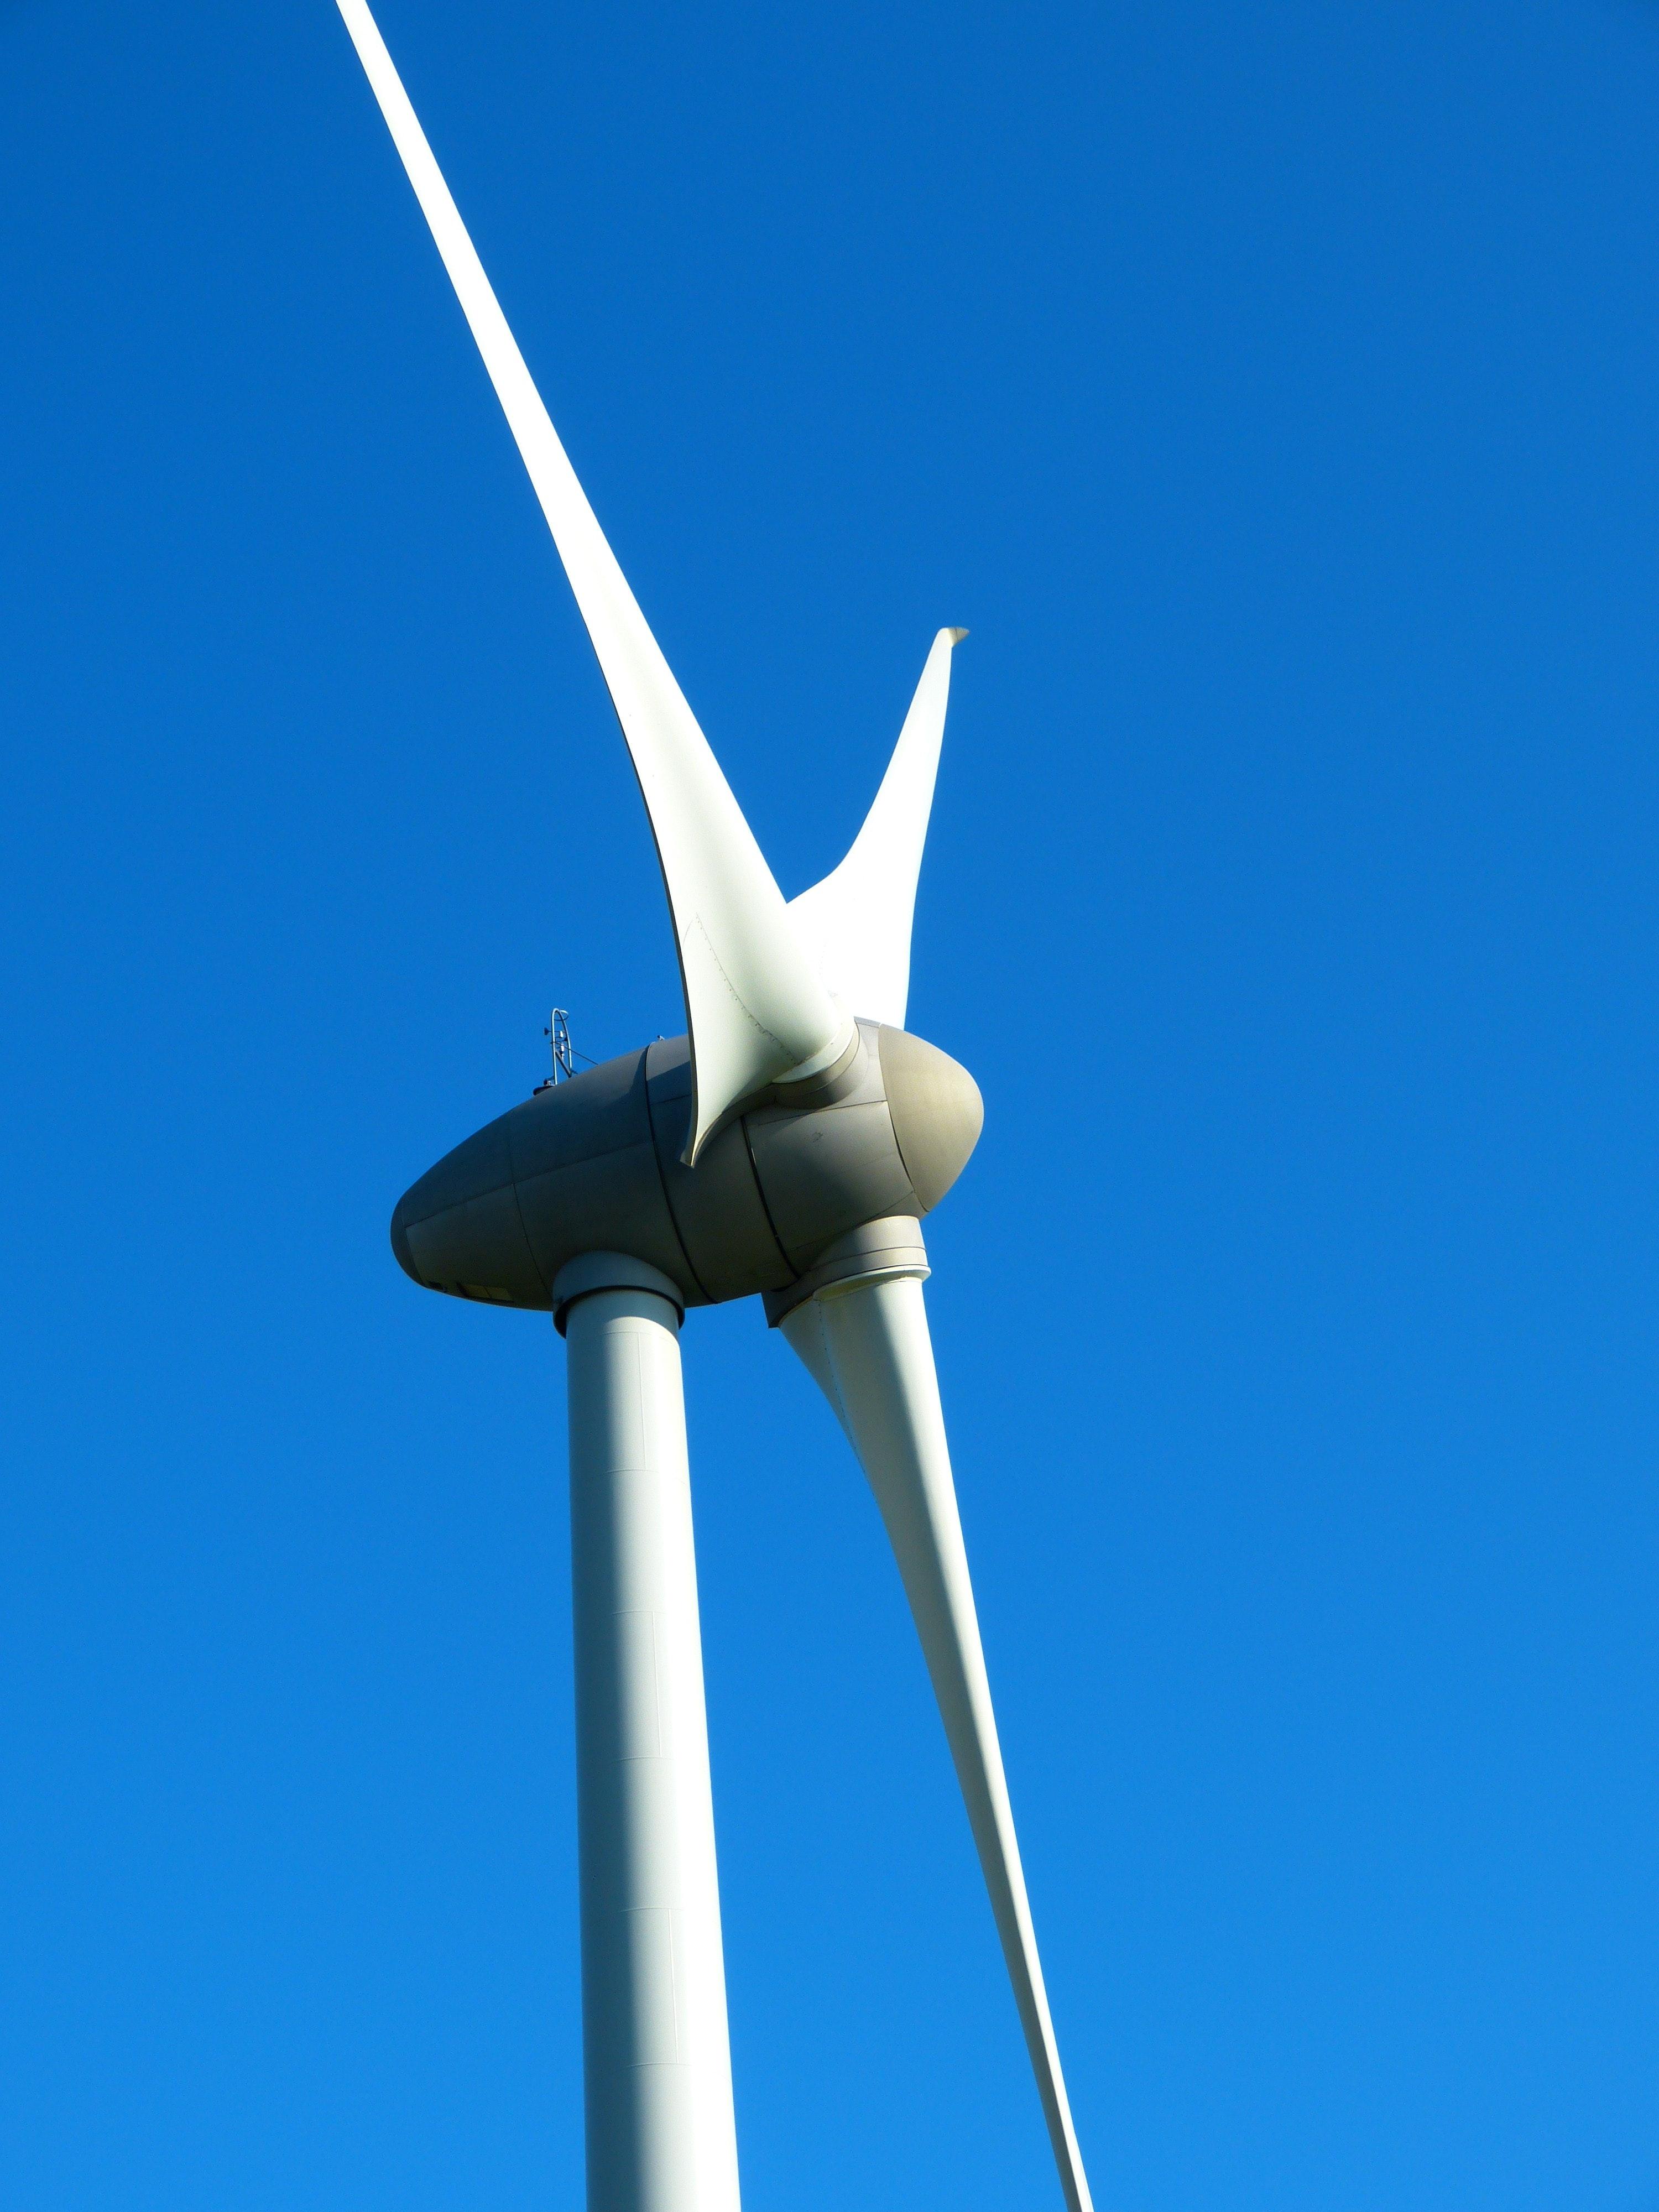 Wind Vane Beside Roof 183 Free Stock Photo